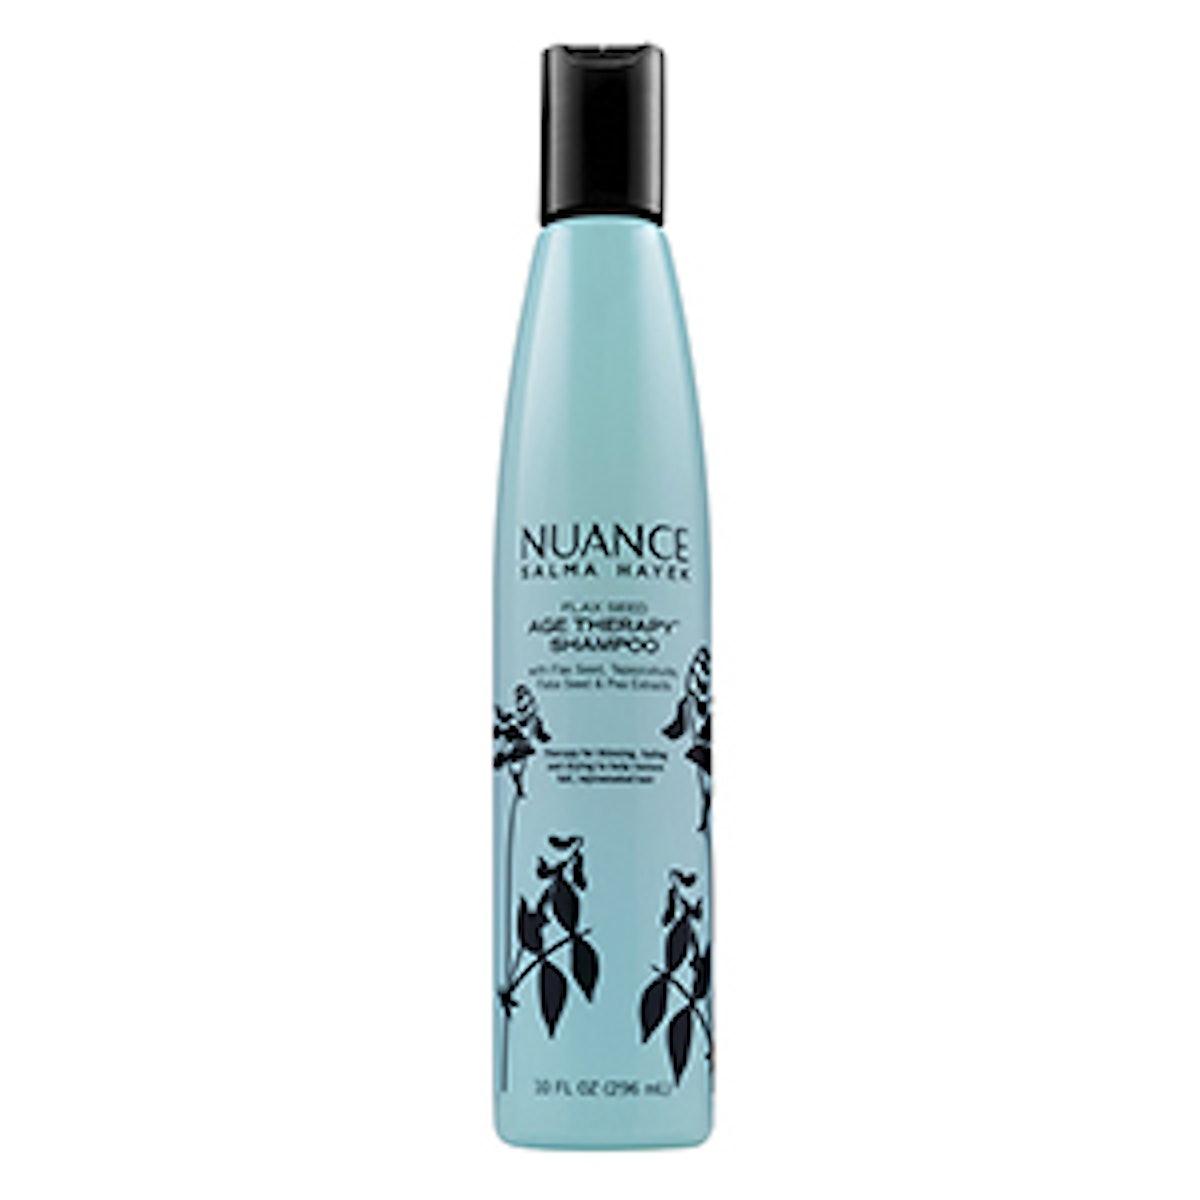 Flax Seed Age Therapy Shampoo